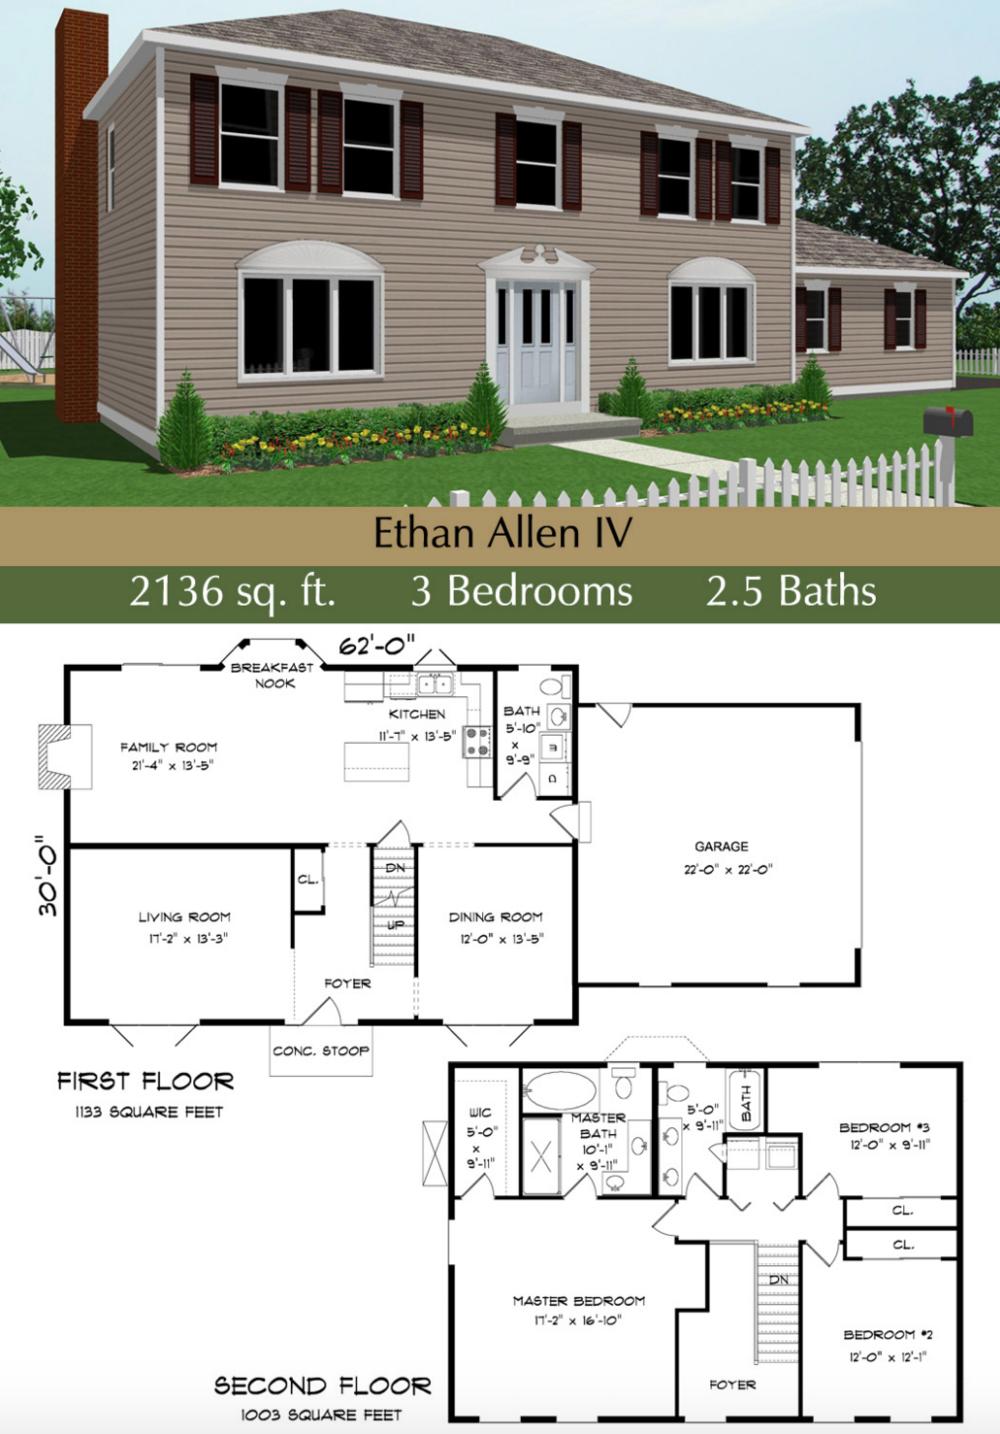 2136 Ethan Allen IV.png